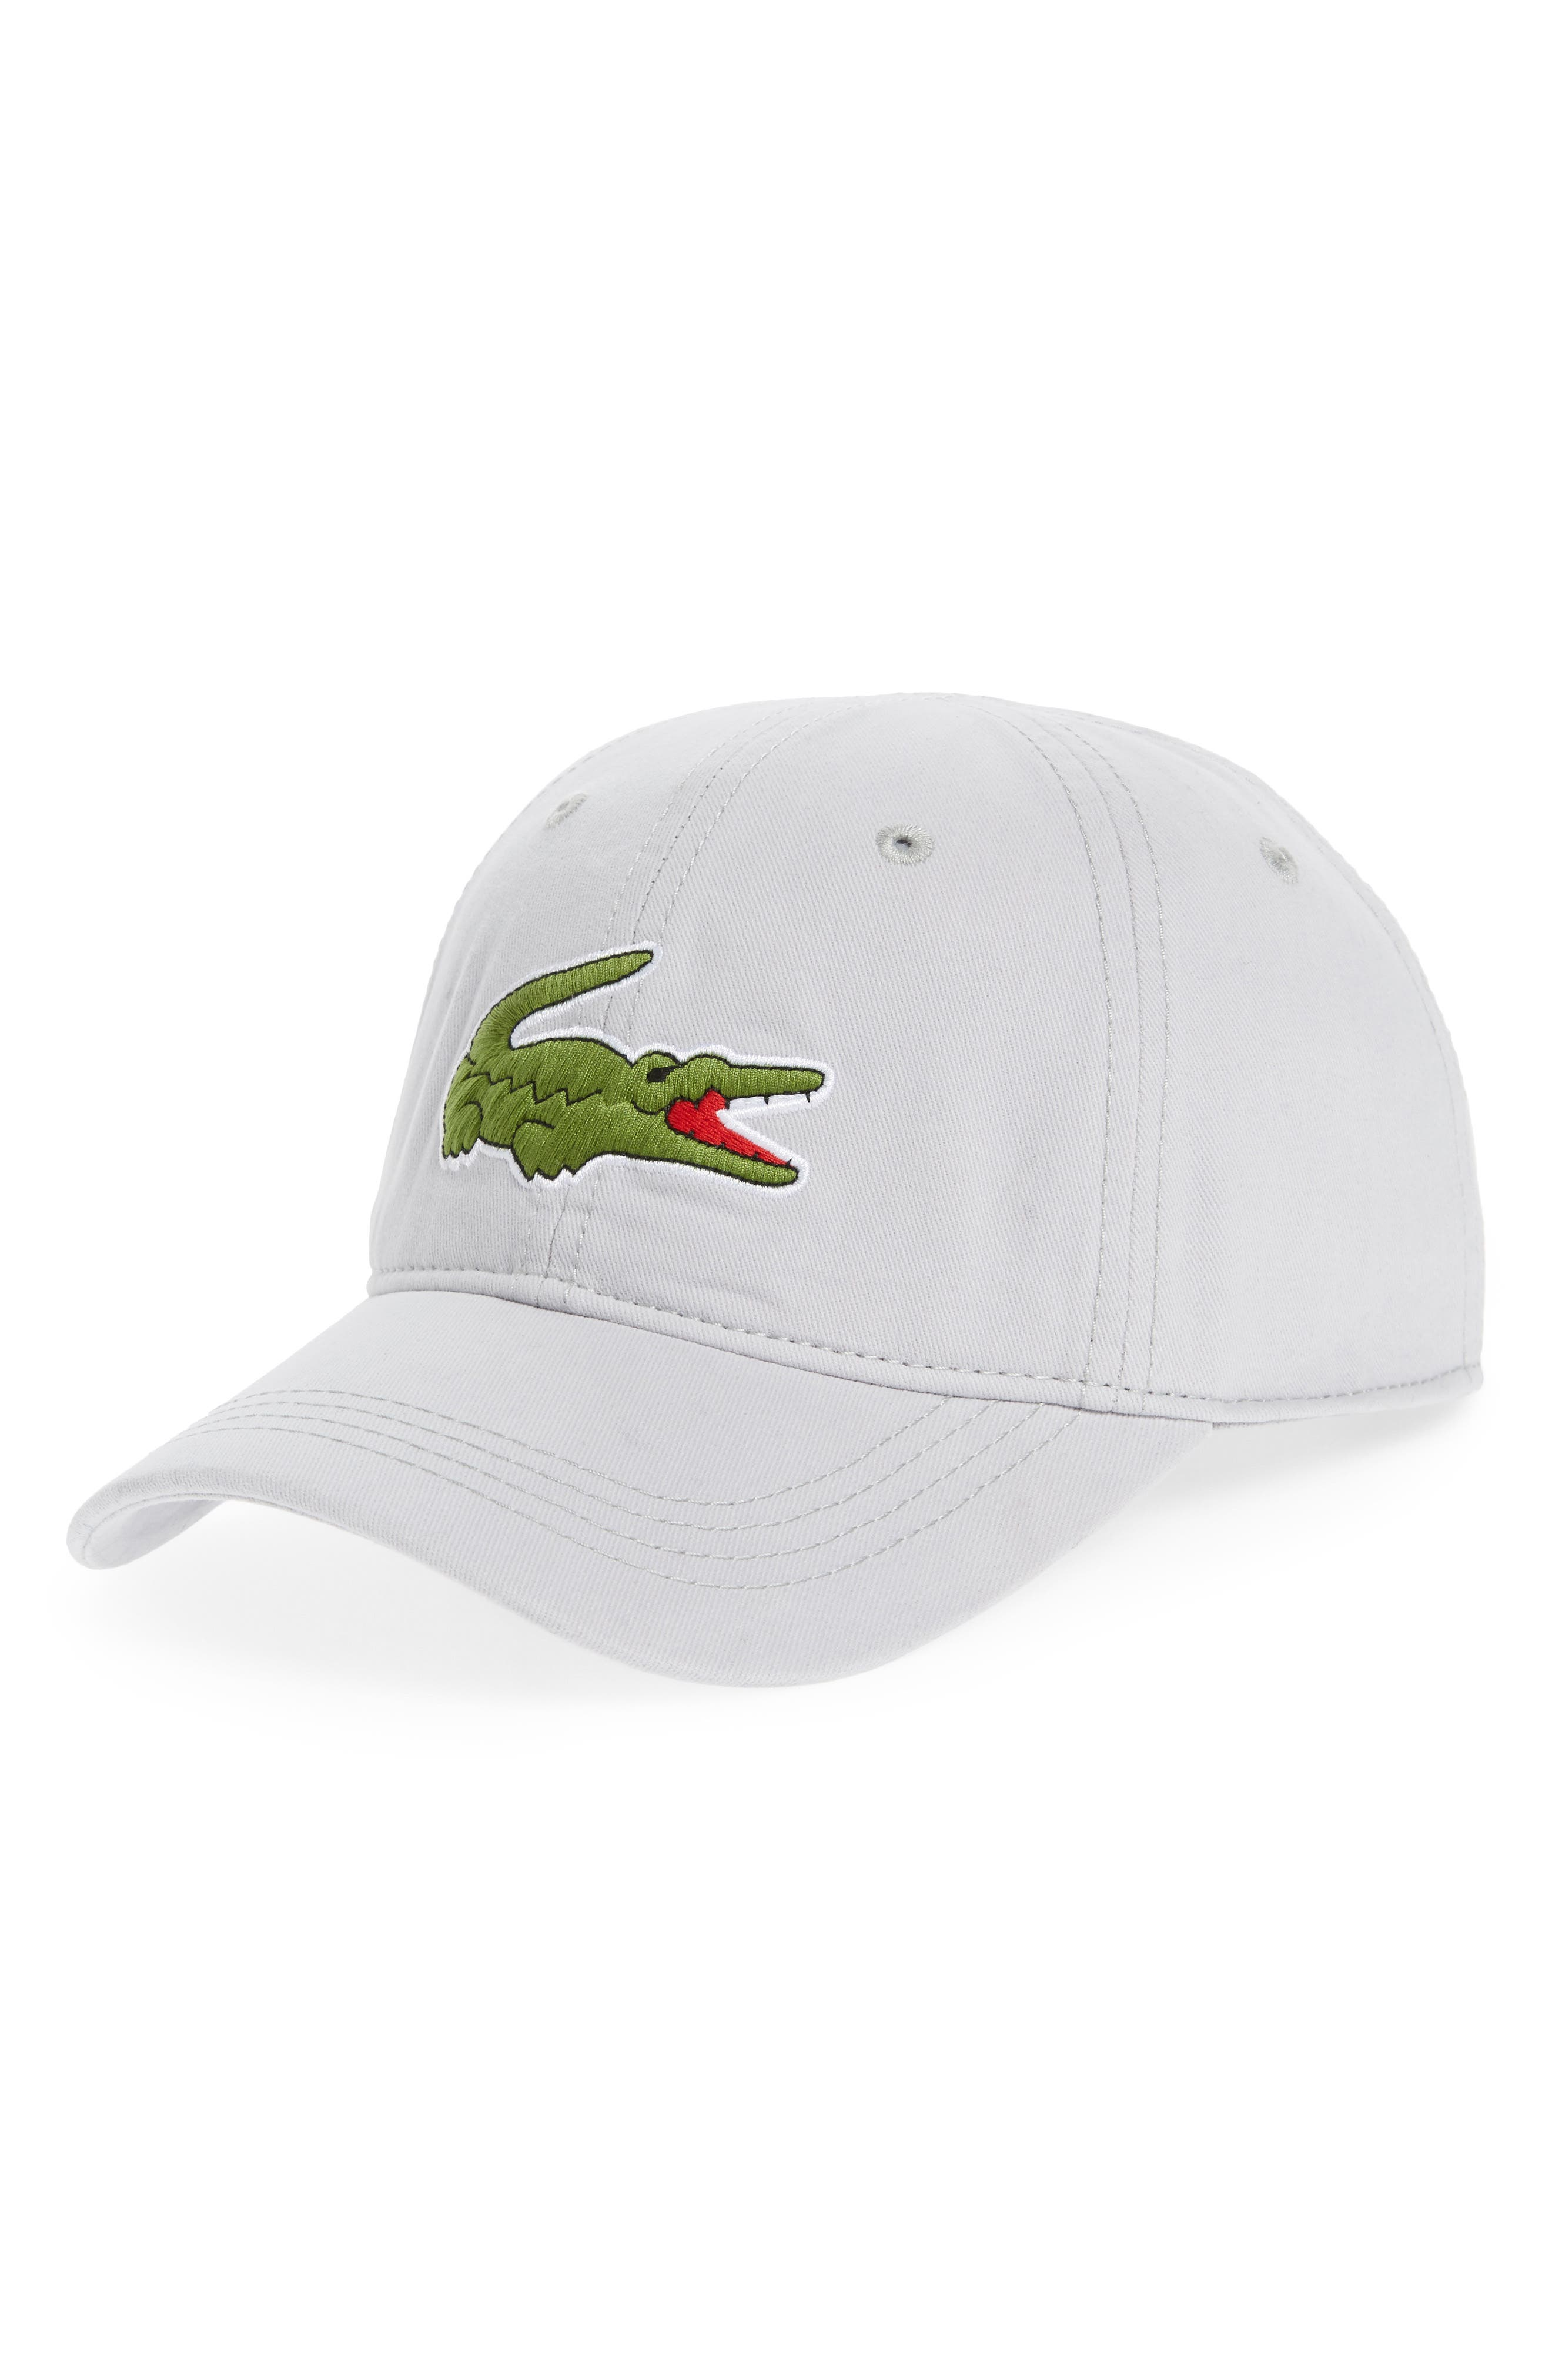 LACOSTE 'Big Croc' Logo Embroidered Cap, Main, color, 020